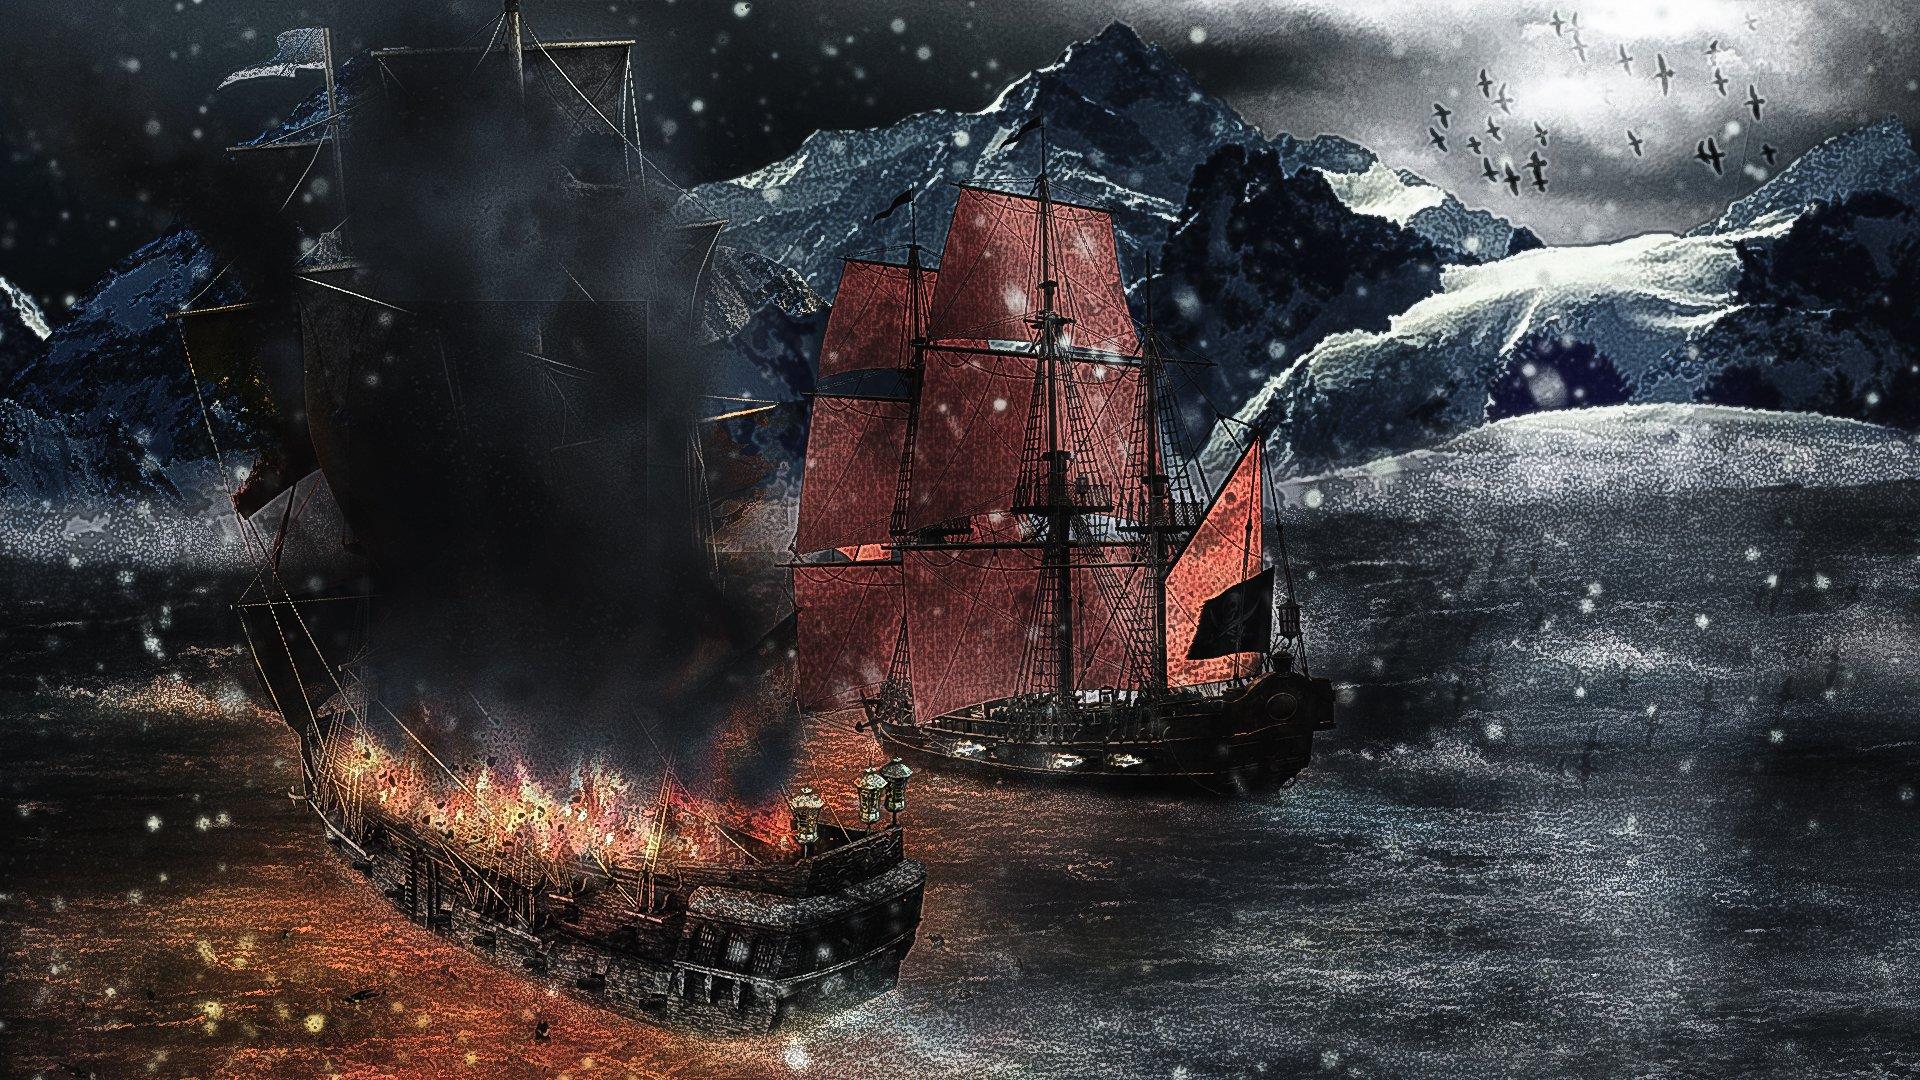 ship pirate sea piratas barcos pirates fondos fantasy sailing ships alegorias wallpapers lost battle battles explosion skull artwork